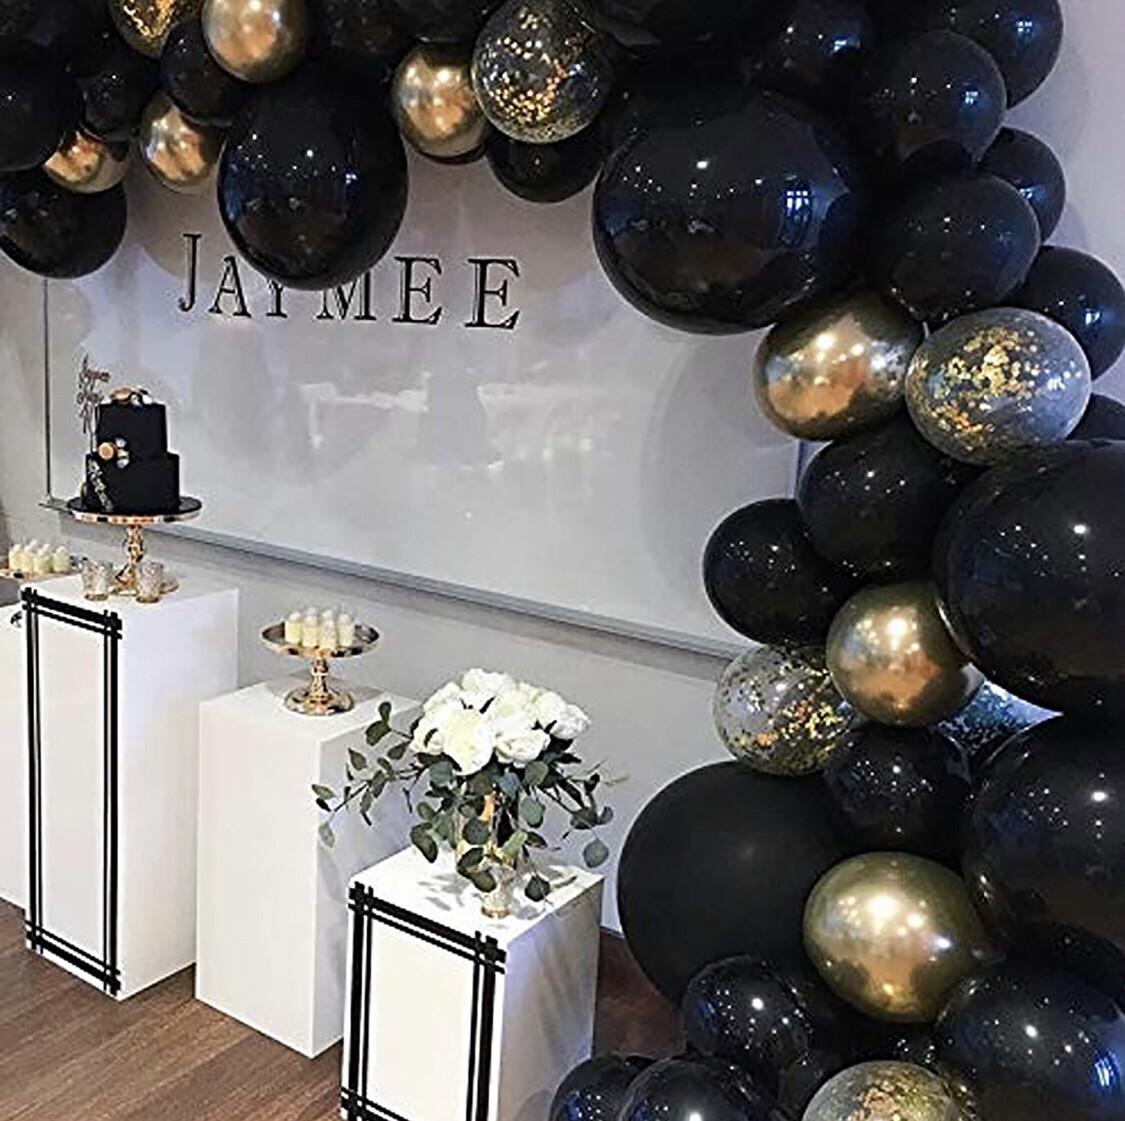 82PCS Black&Gold Balloon Garland Arch Kit Balloons for Halloween Birthday Wedding Photo Booth Backdrop Bridal Part suppies